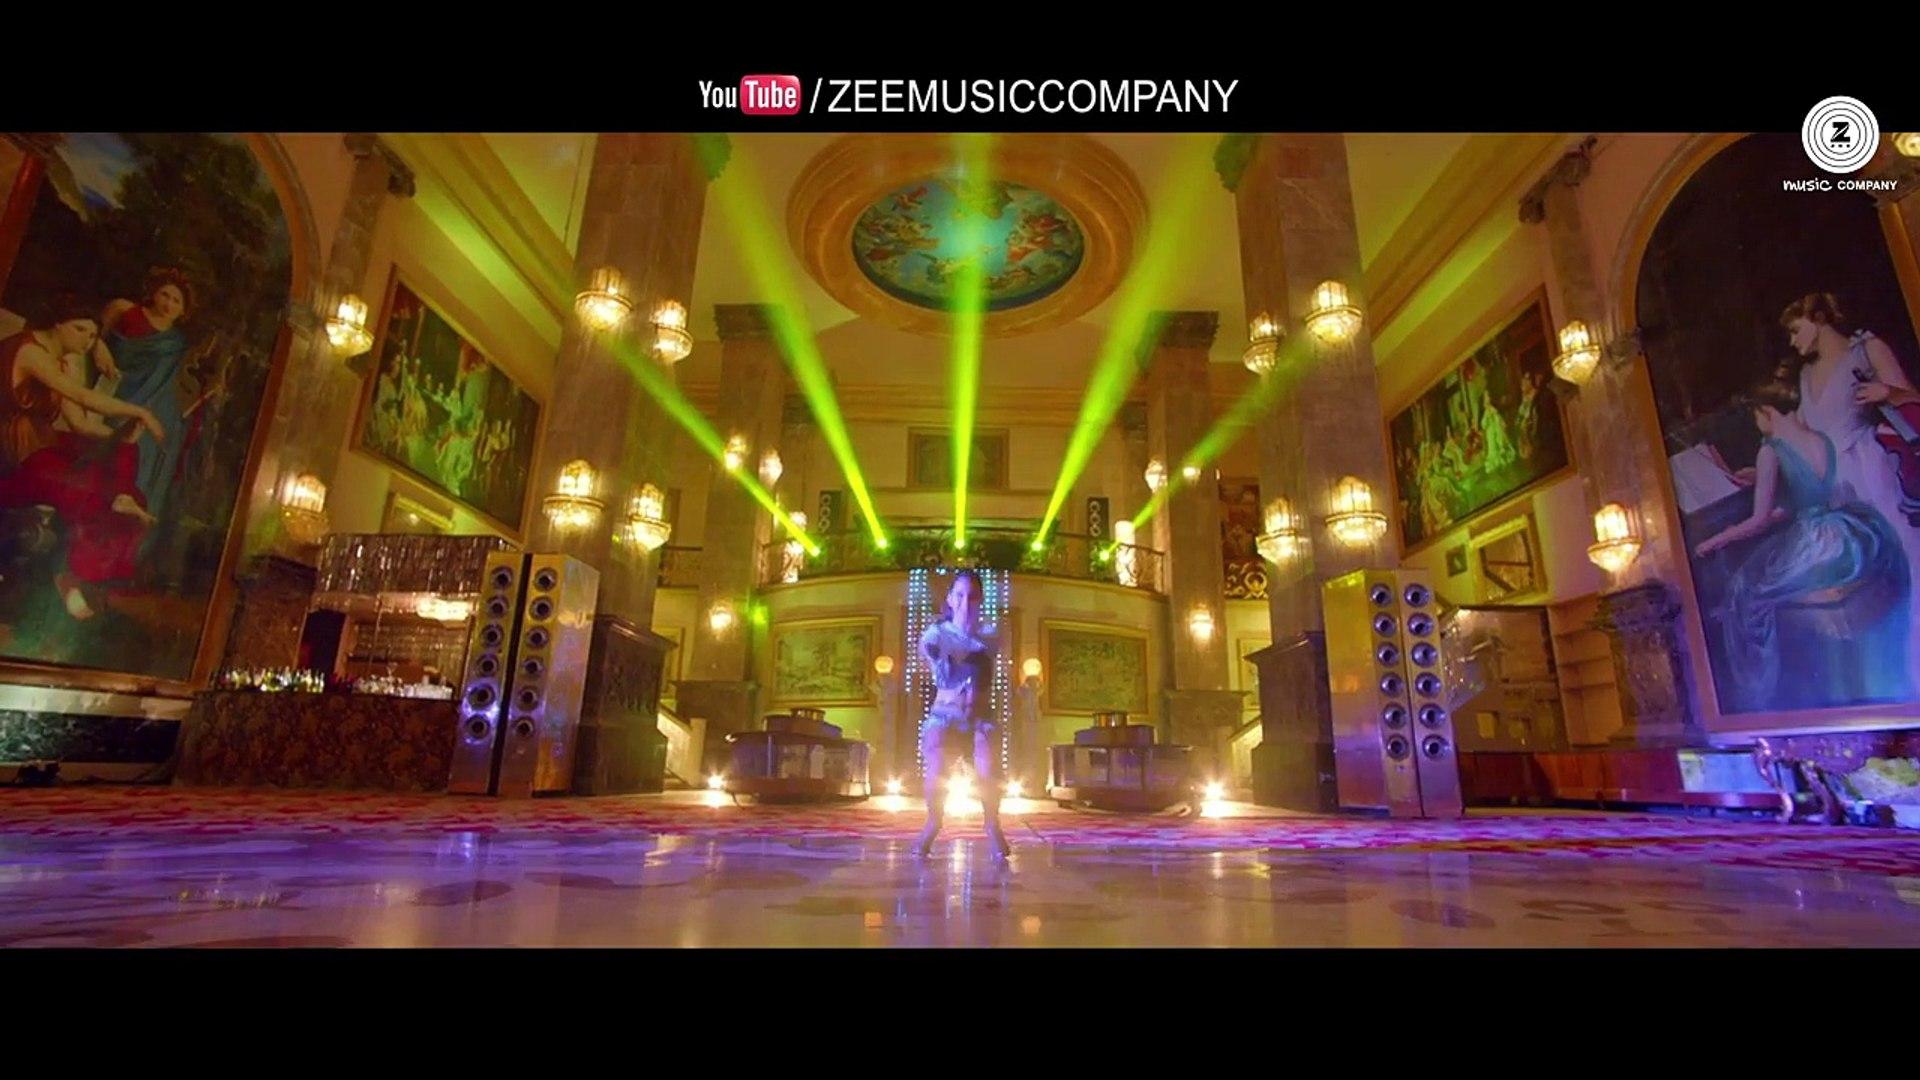 Baby Marvake Maanegi - Raftaar _ Nora Fatehi _ Remo D'souza _ Official Music Vid_HD